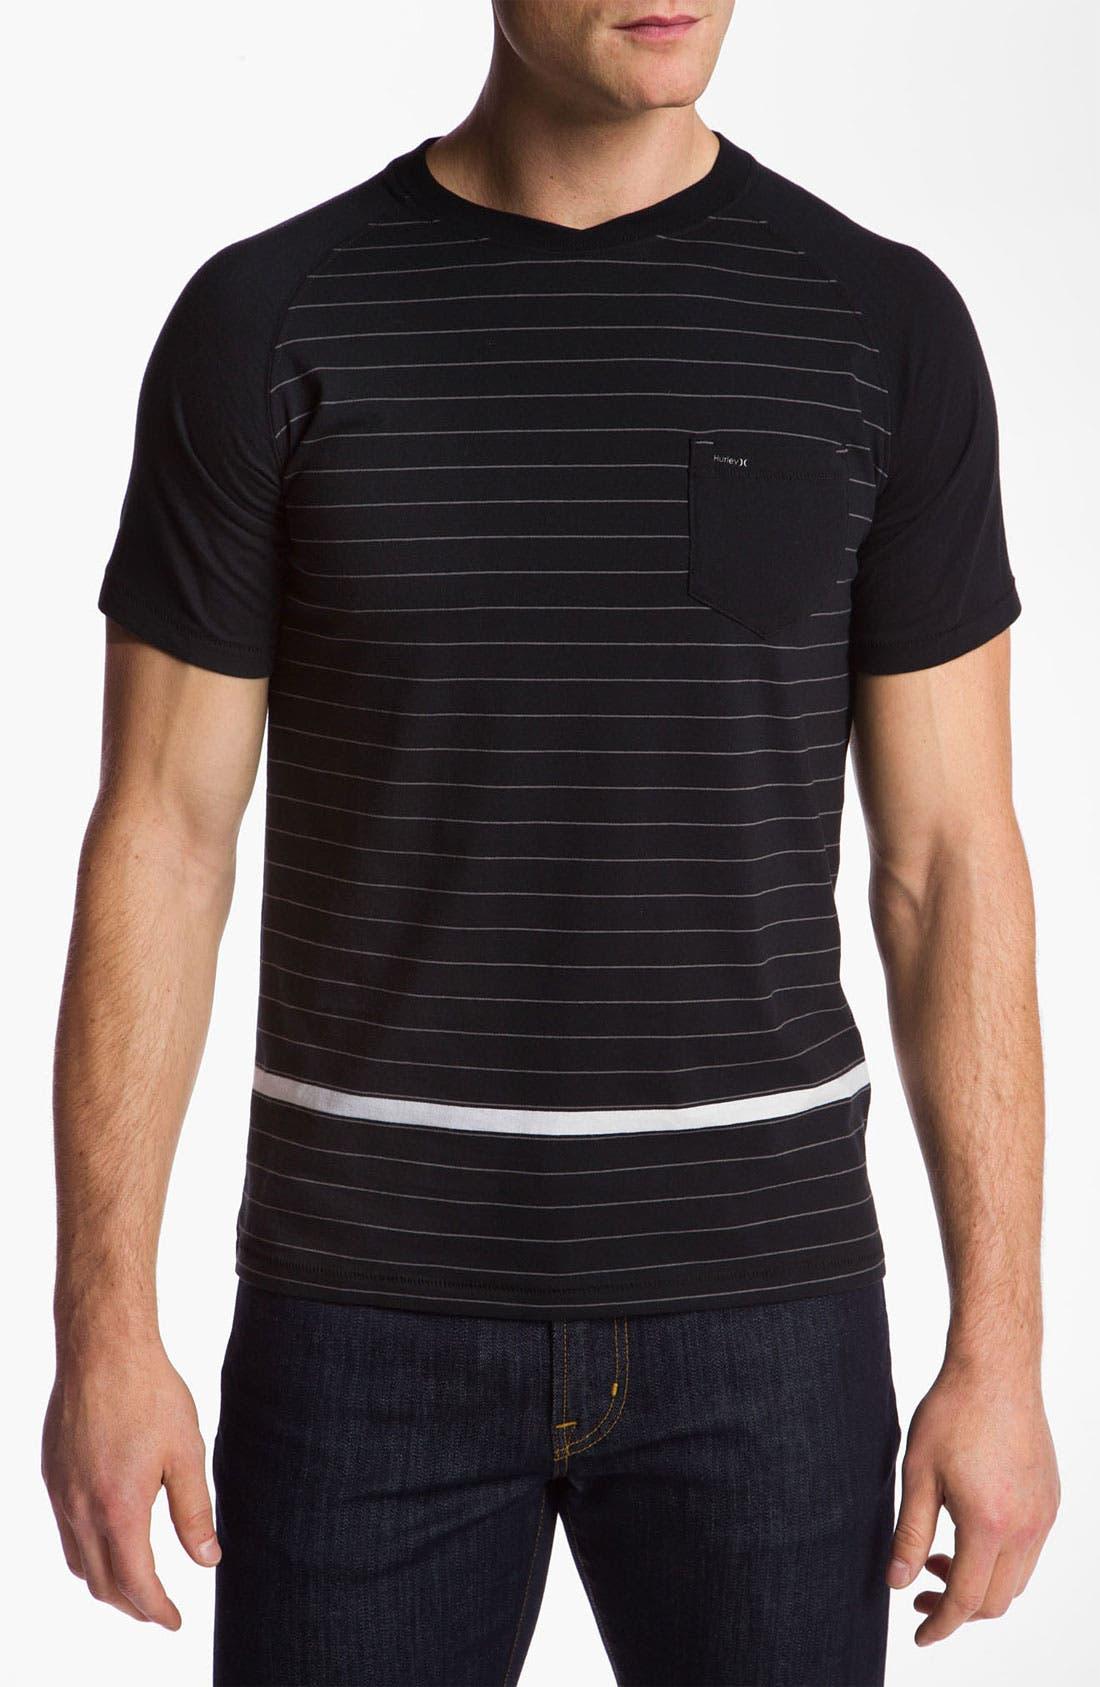 Alternate Image 1 Selected - Hurley 'Cycle' Crewneck T-Shirt